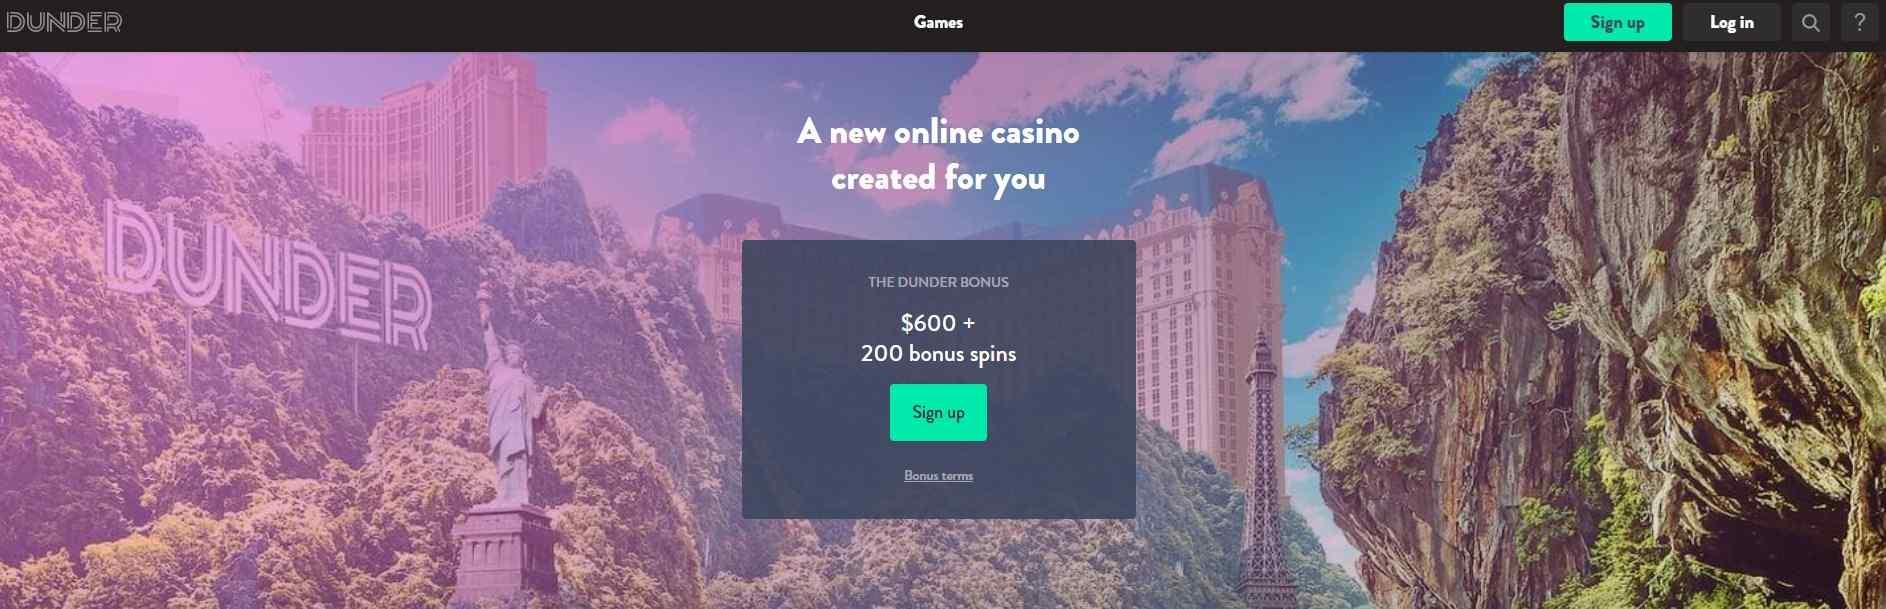 Dunder Casino Ca 600 Bonus 200 Free Spins Mapleslot